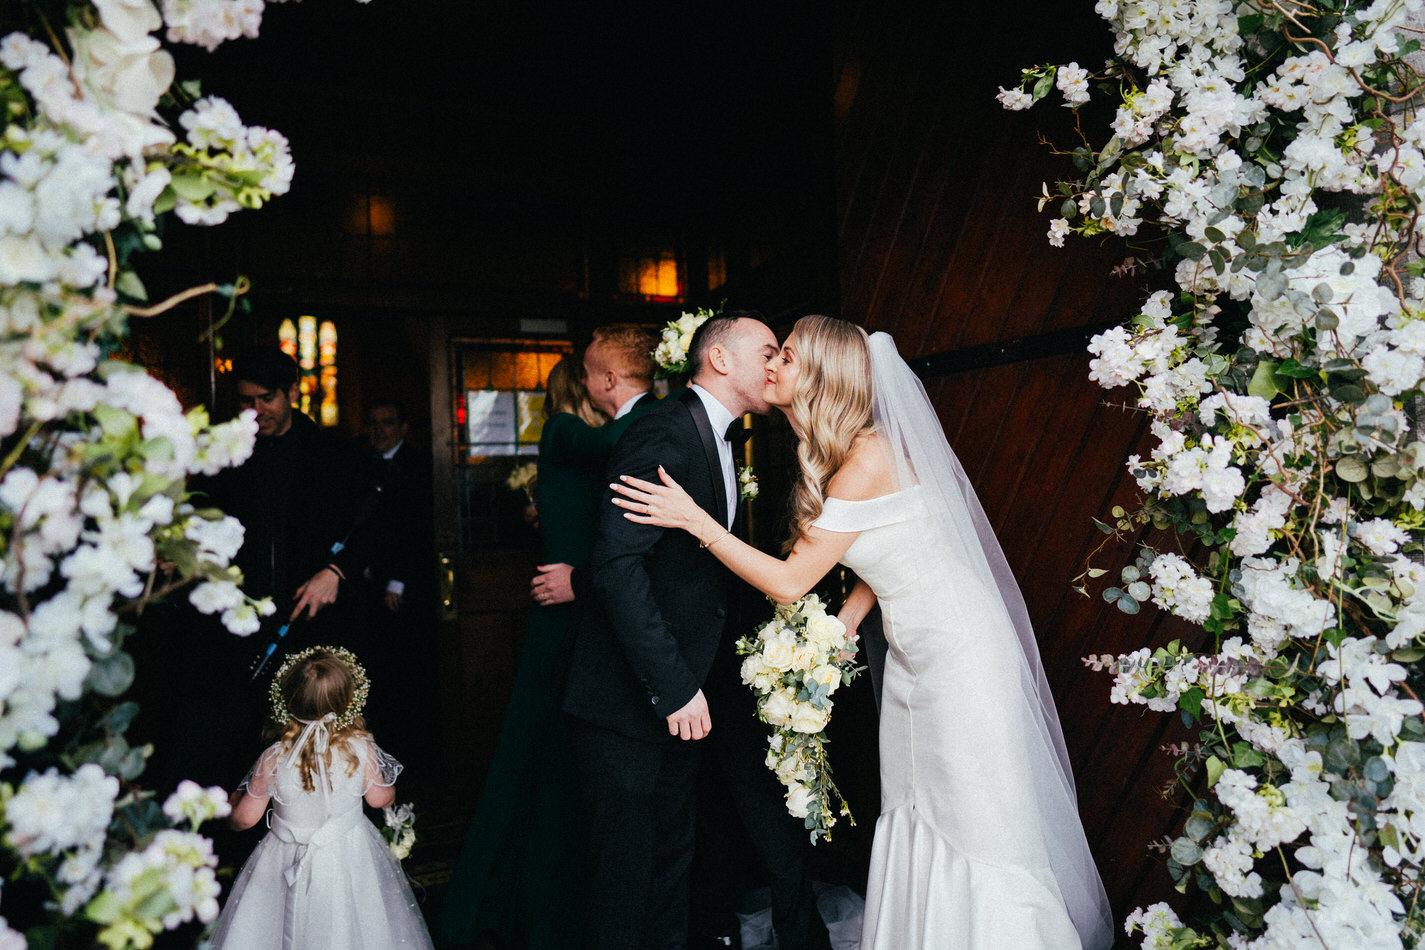 Castle-wedding-ireland-photos- 0152 104